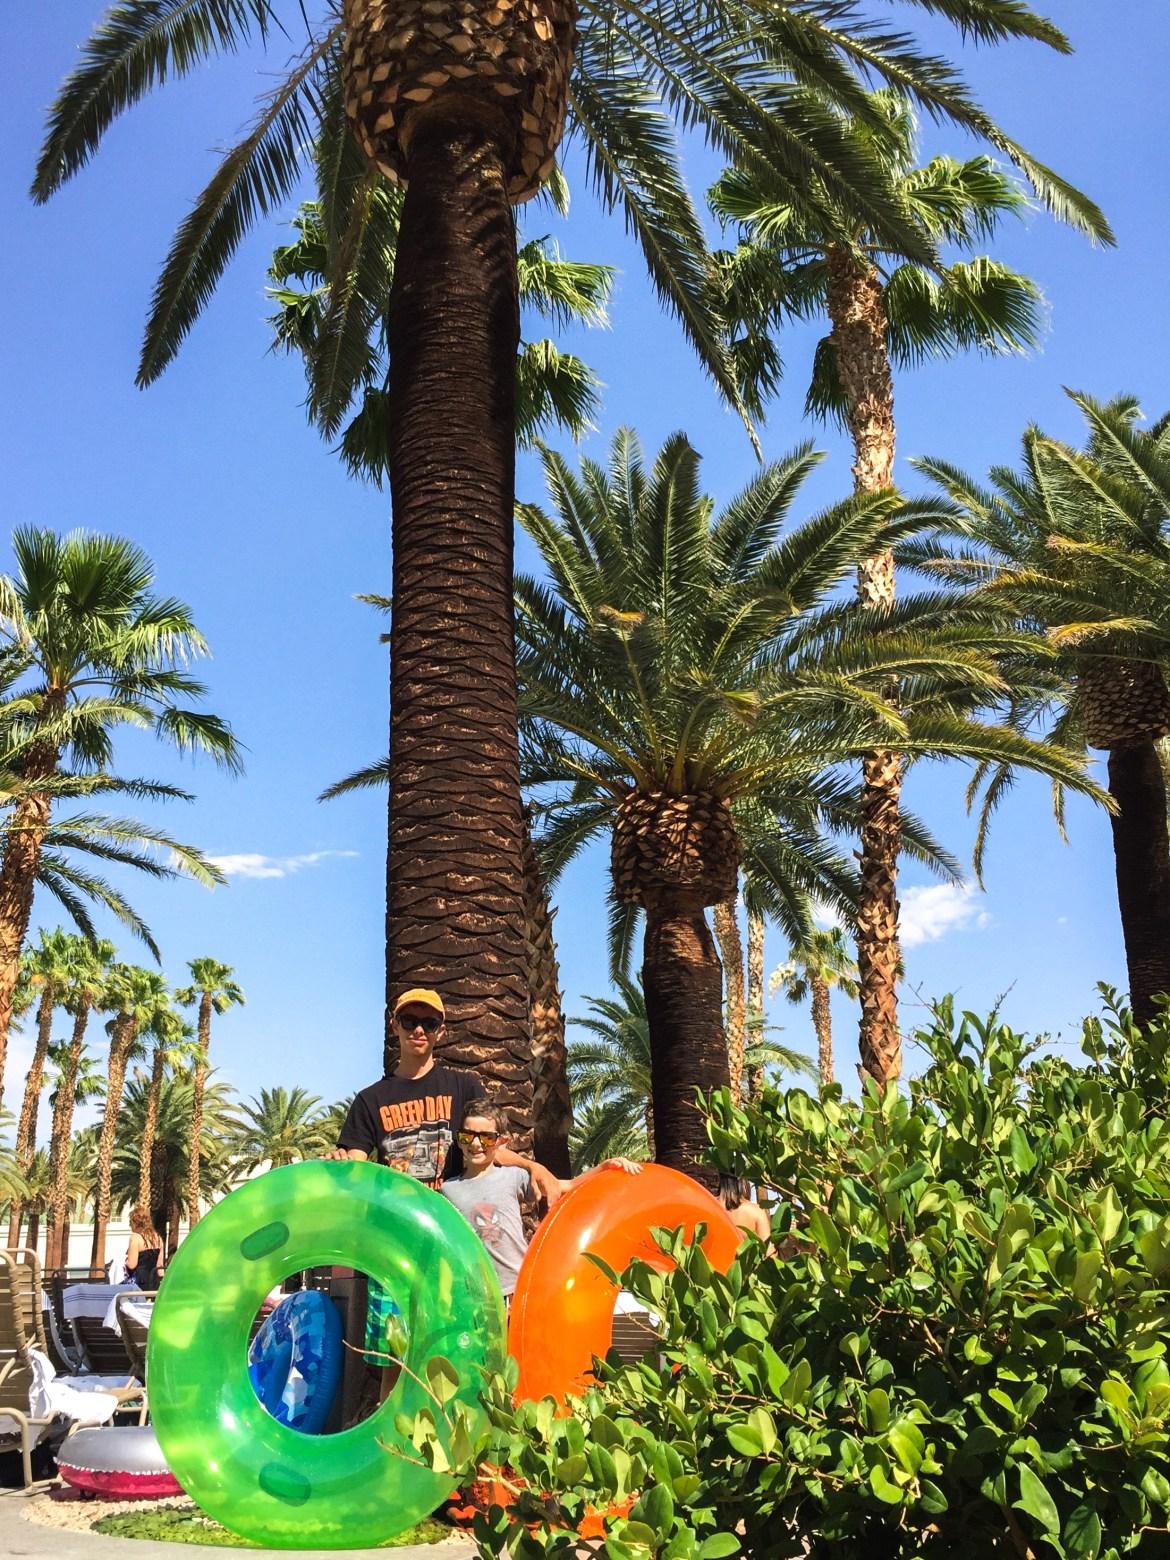 Things to do in Las Vegas Mandalay Bay Pool